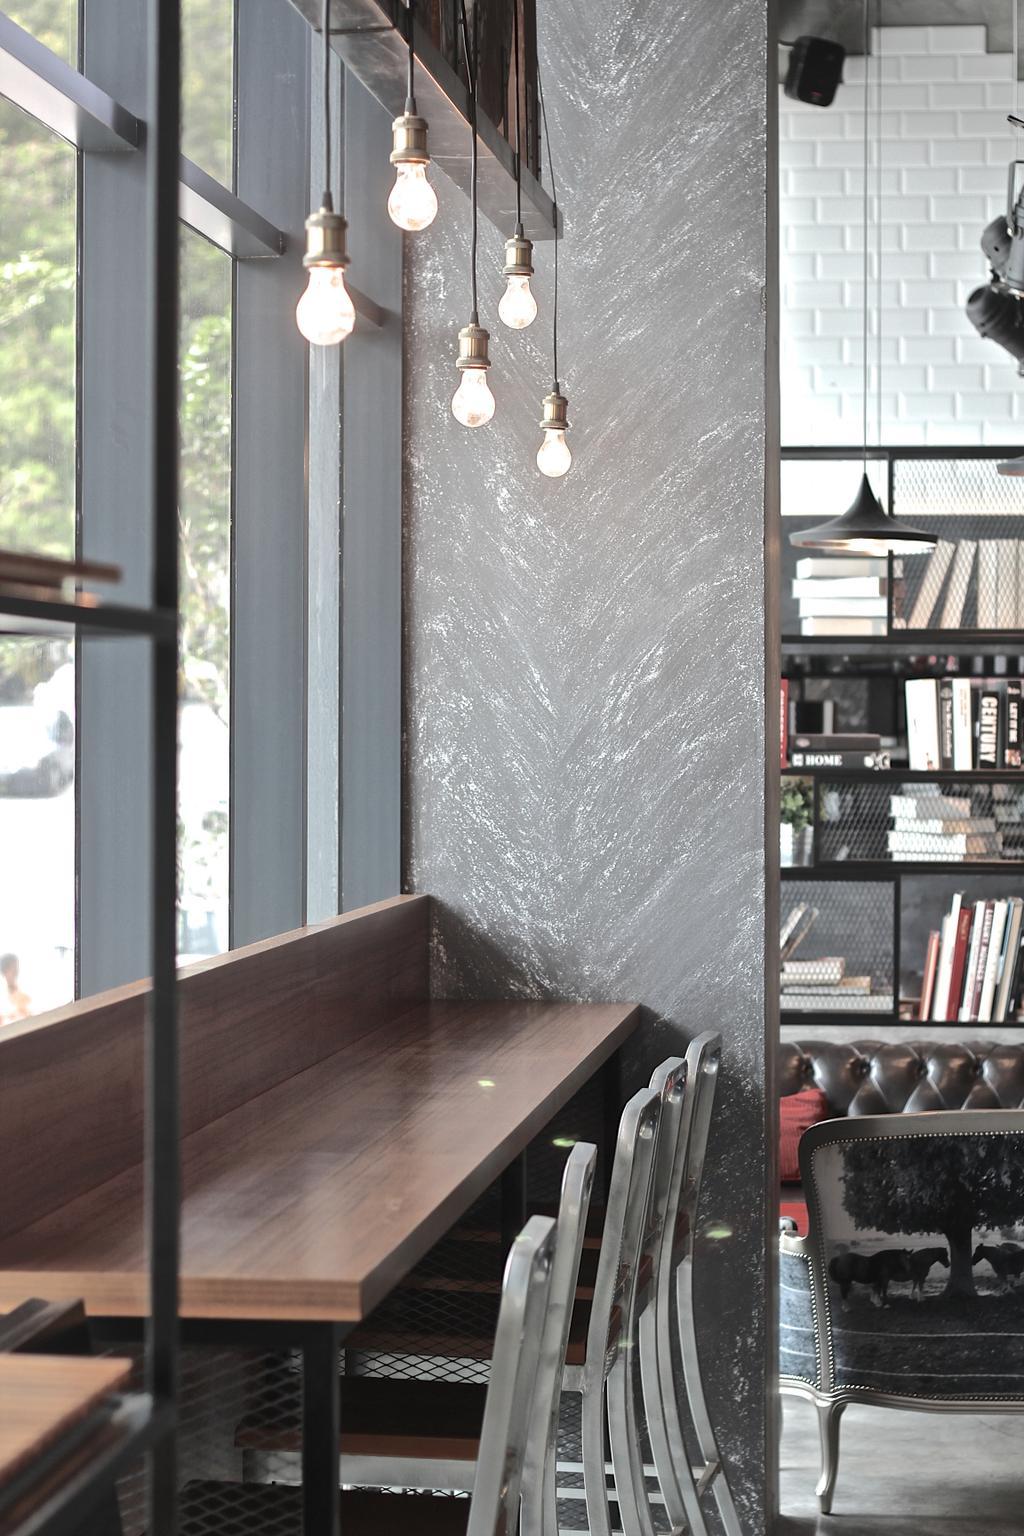 Renoma Cafe @ Ikon Connaught, Commercial, Interior Designer, MLA Design, Industrial, Countertop, Bar Top, Bar Stools, Cafe, Hanging Lamps, Pendant Lamps, Light Bulb Pendant Lamps, Light Bulb, Bookshelf, Book, Blackboard, Window